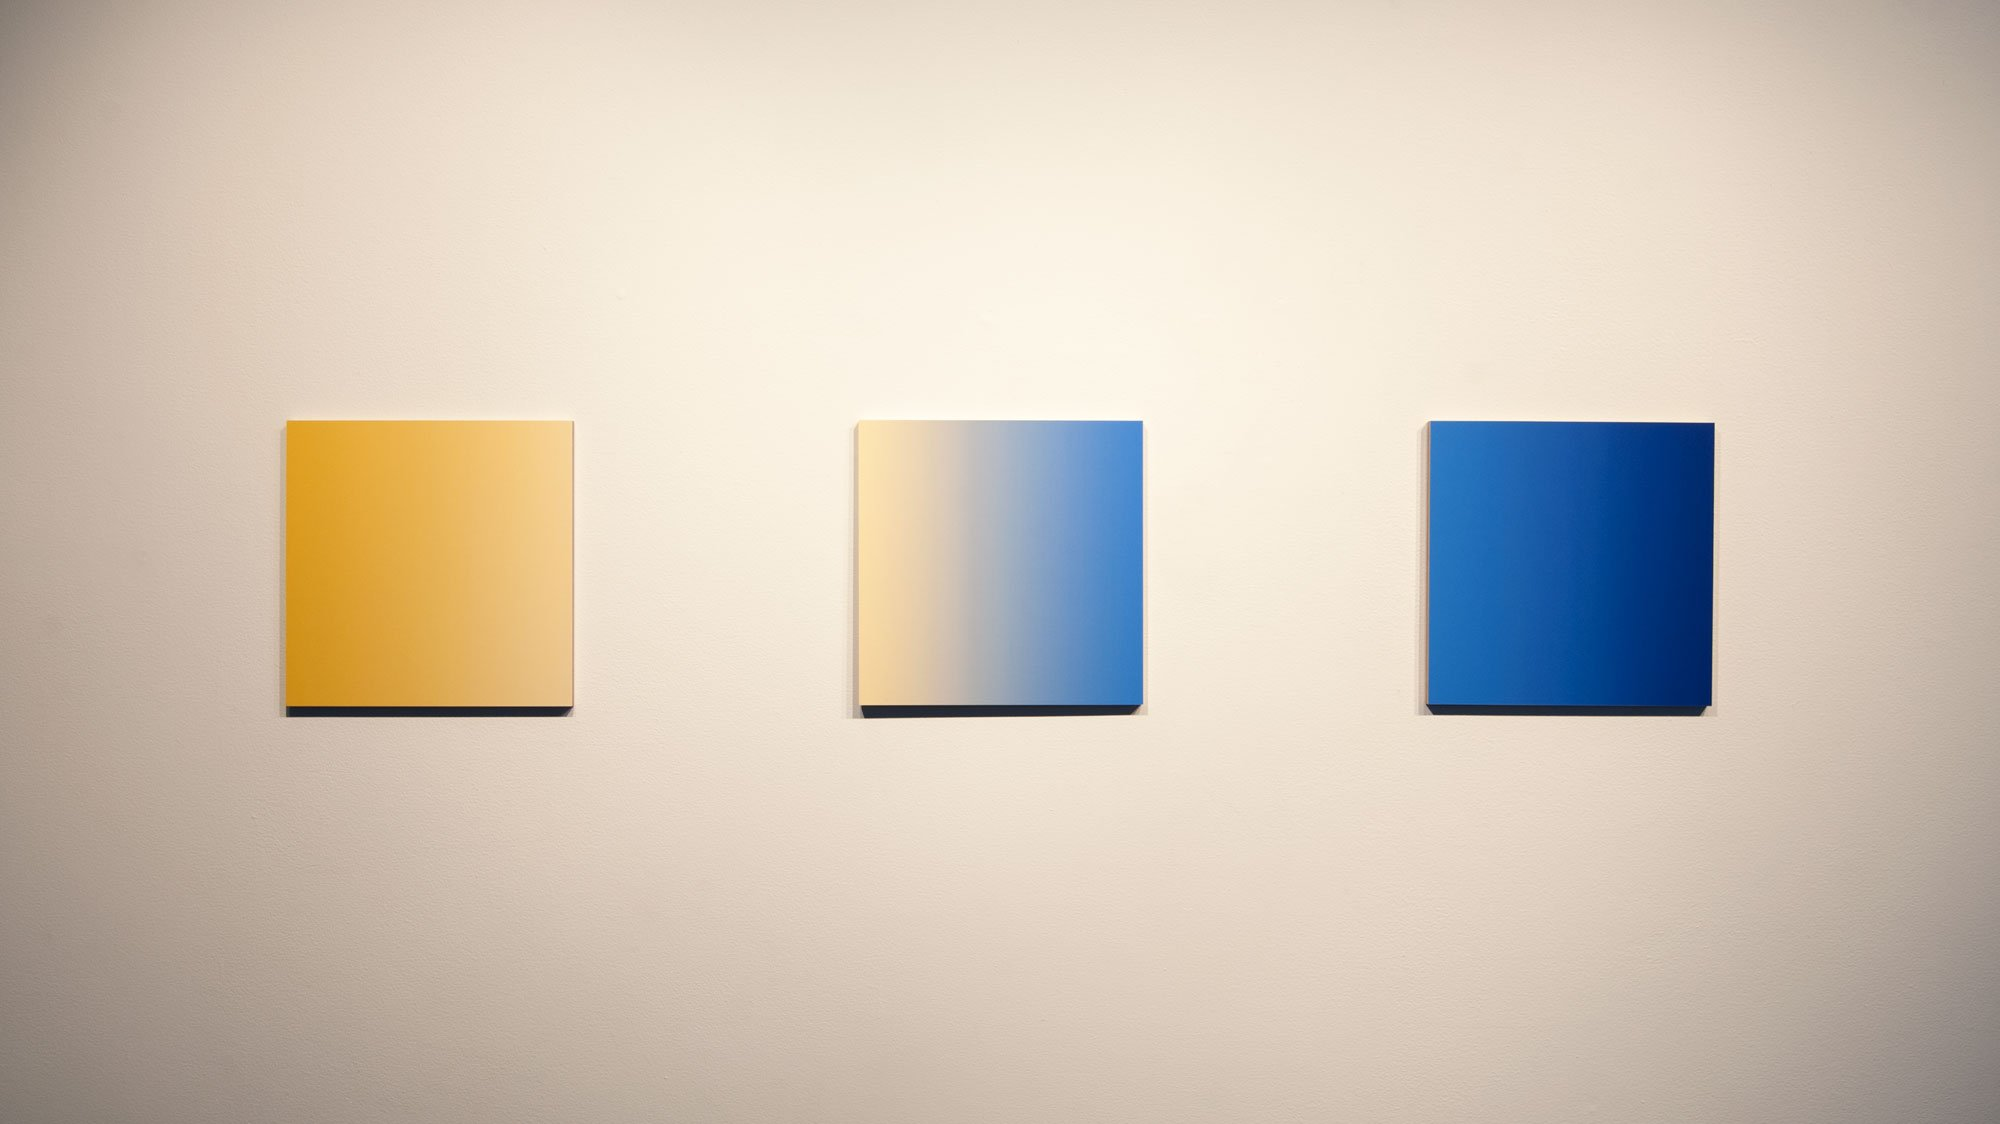 Scalar Field Triptych (f9bf3b, fde3a7, 4183d7, 1f3a93)